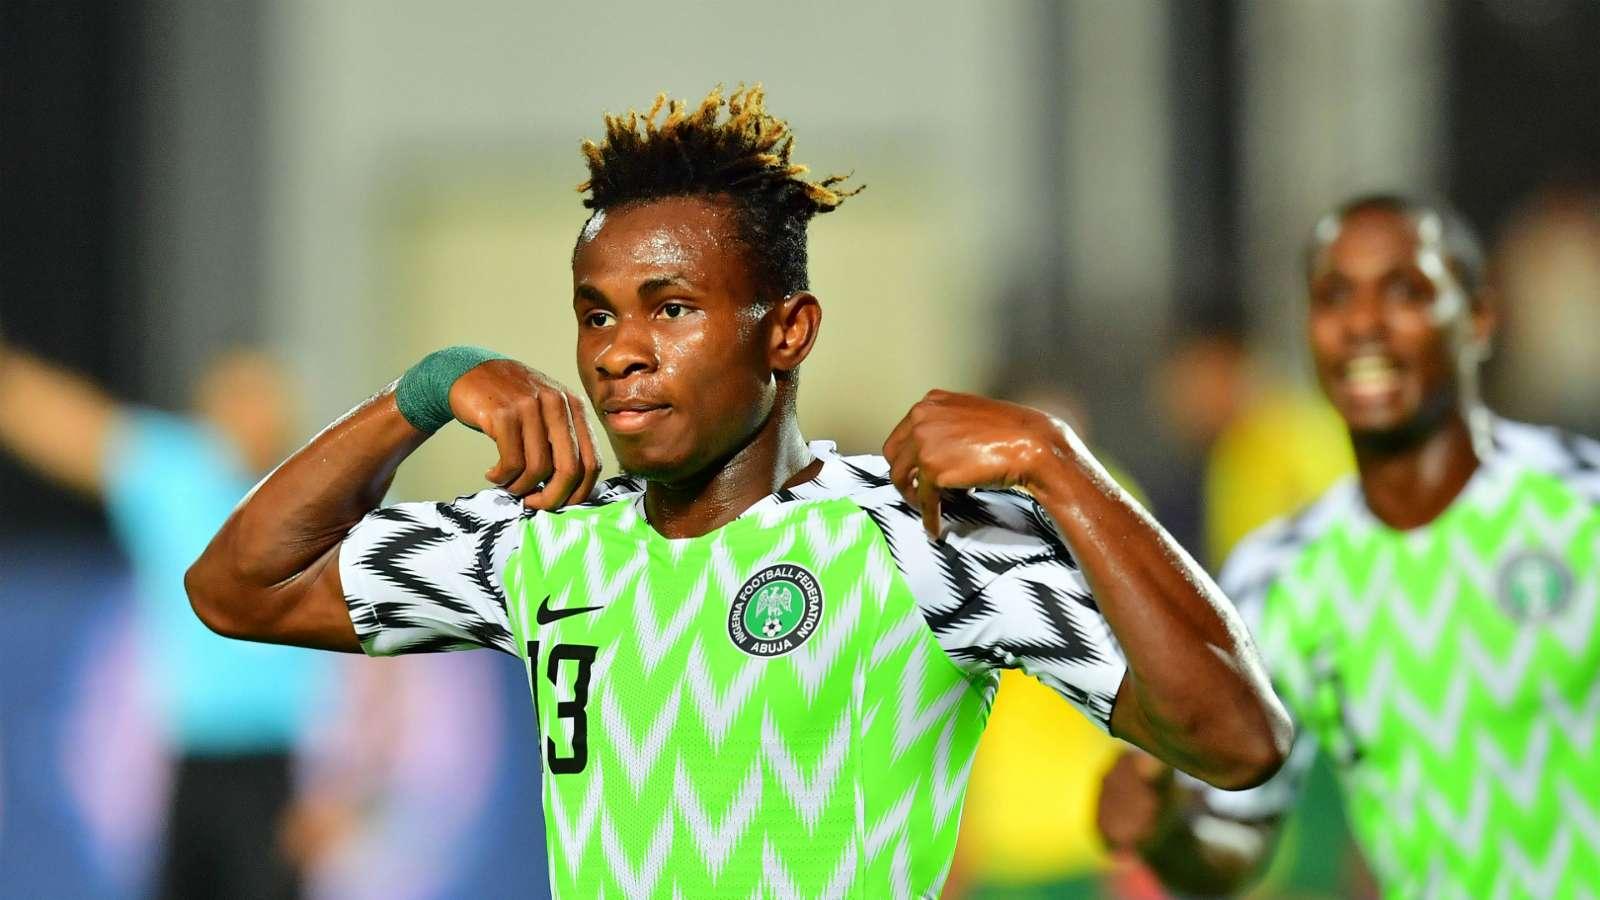 Afcon 2019:Twitter在四分之一决赛中击败南非队时做出反应